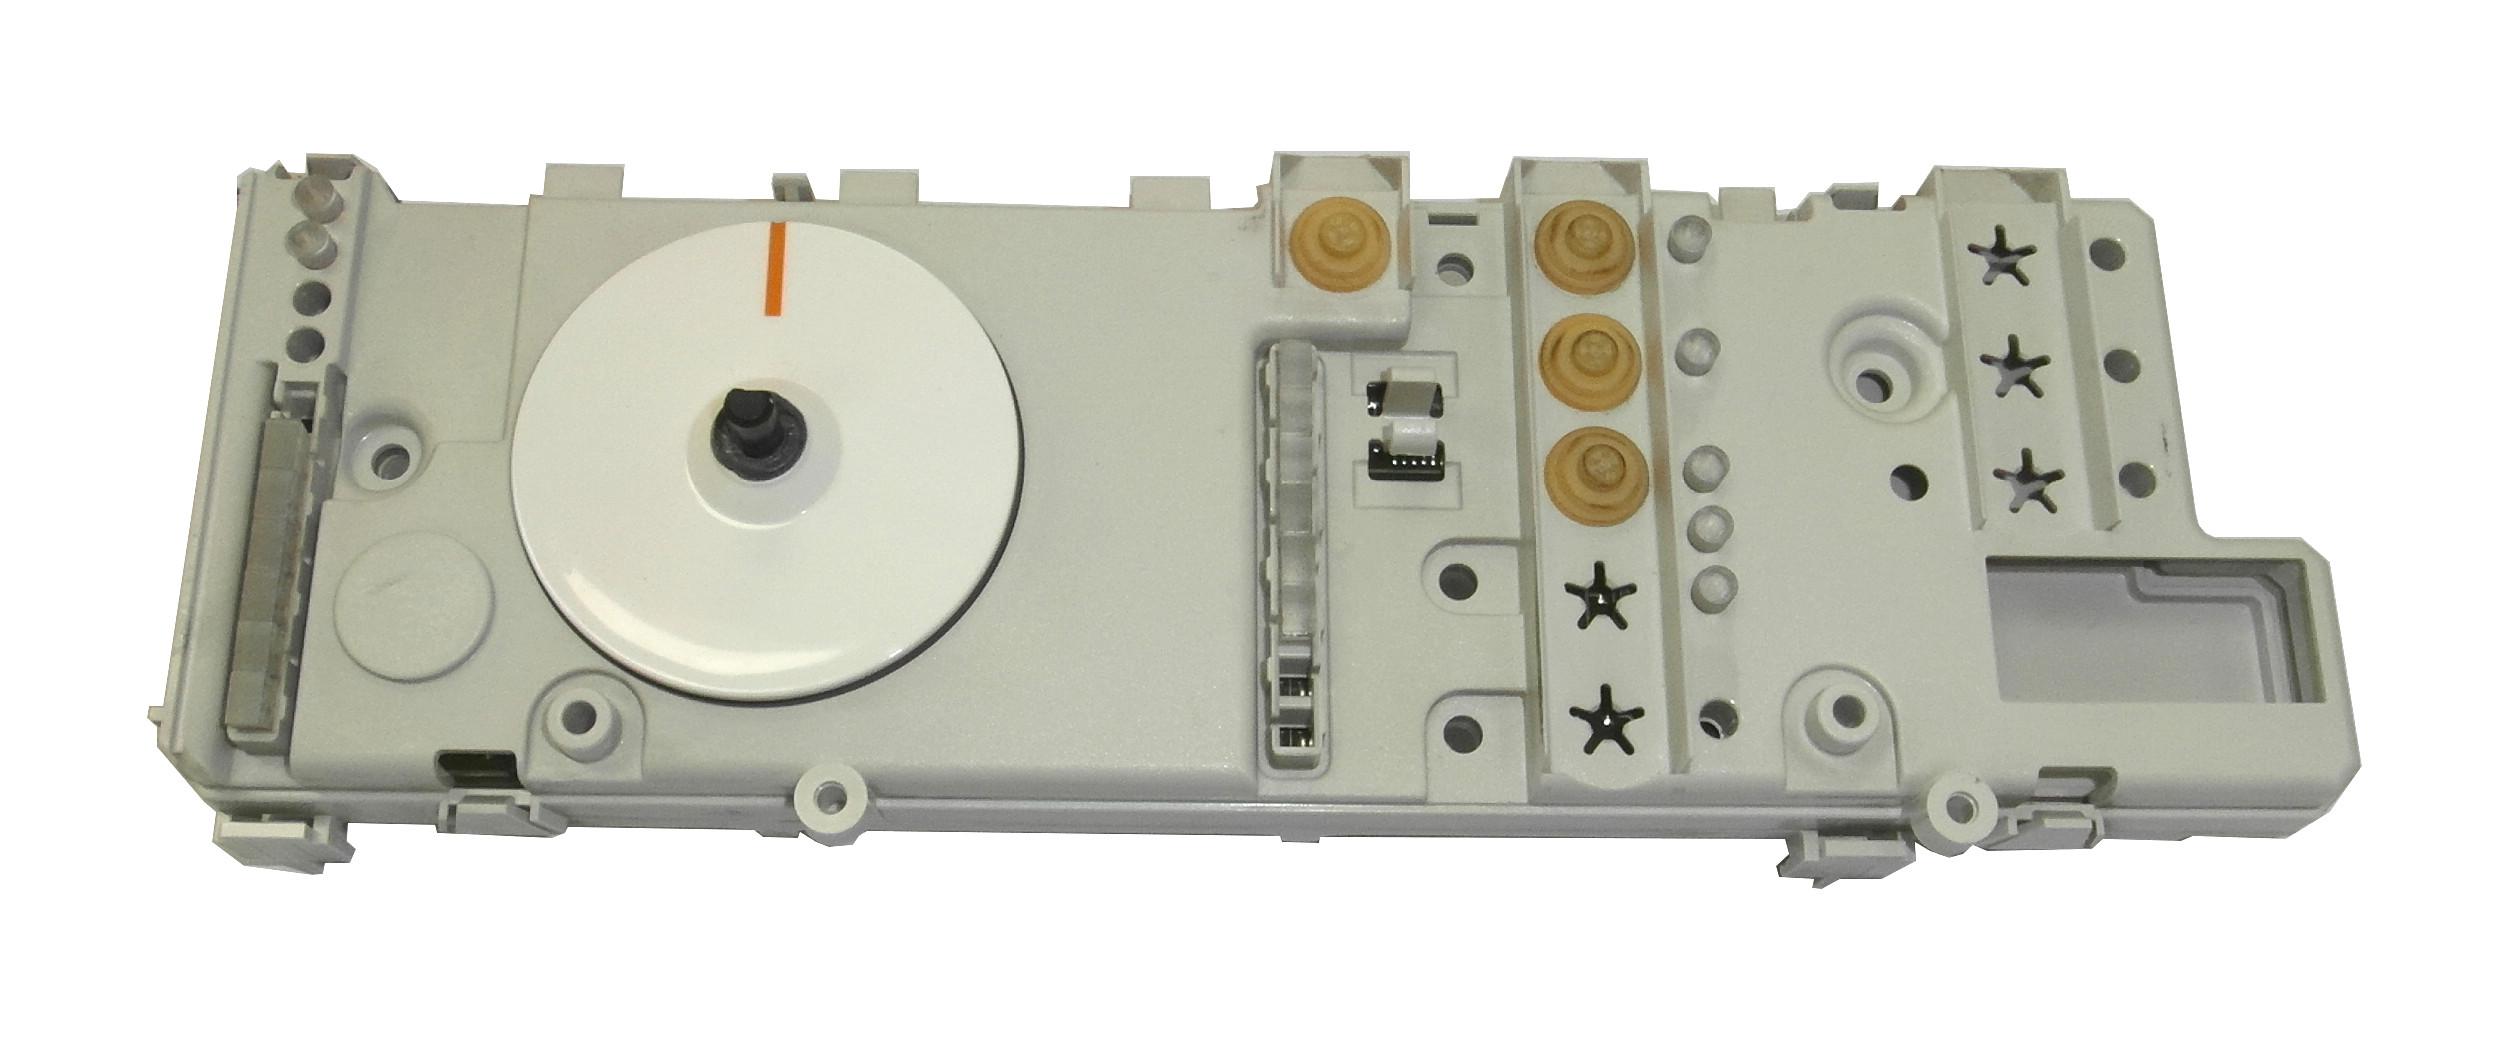 Washing Machine Controls : Miele washing machine pcb control board edpw  ebay